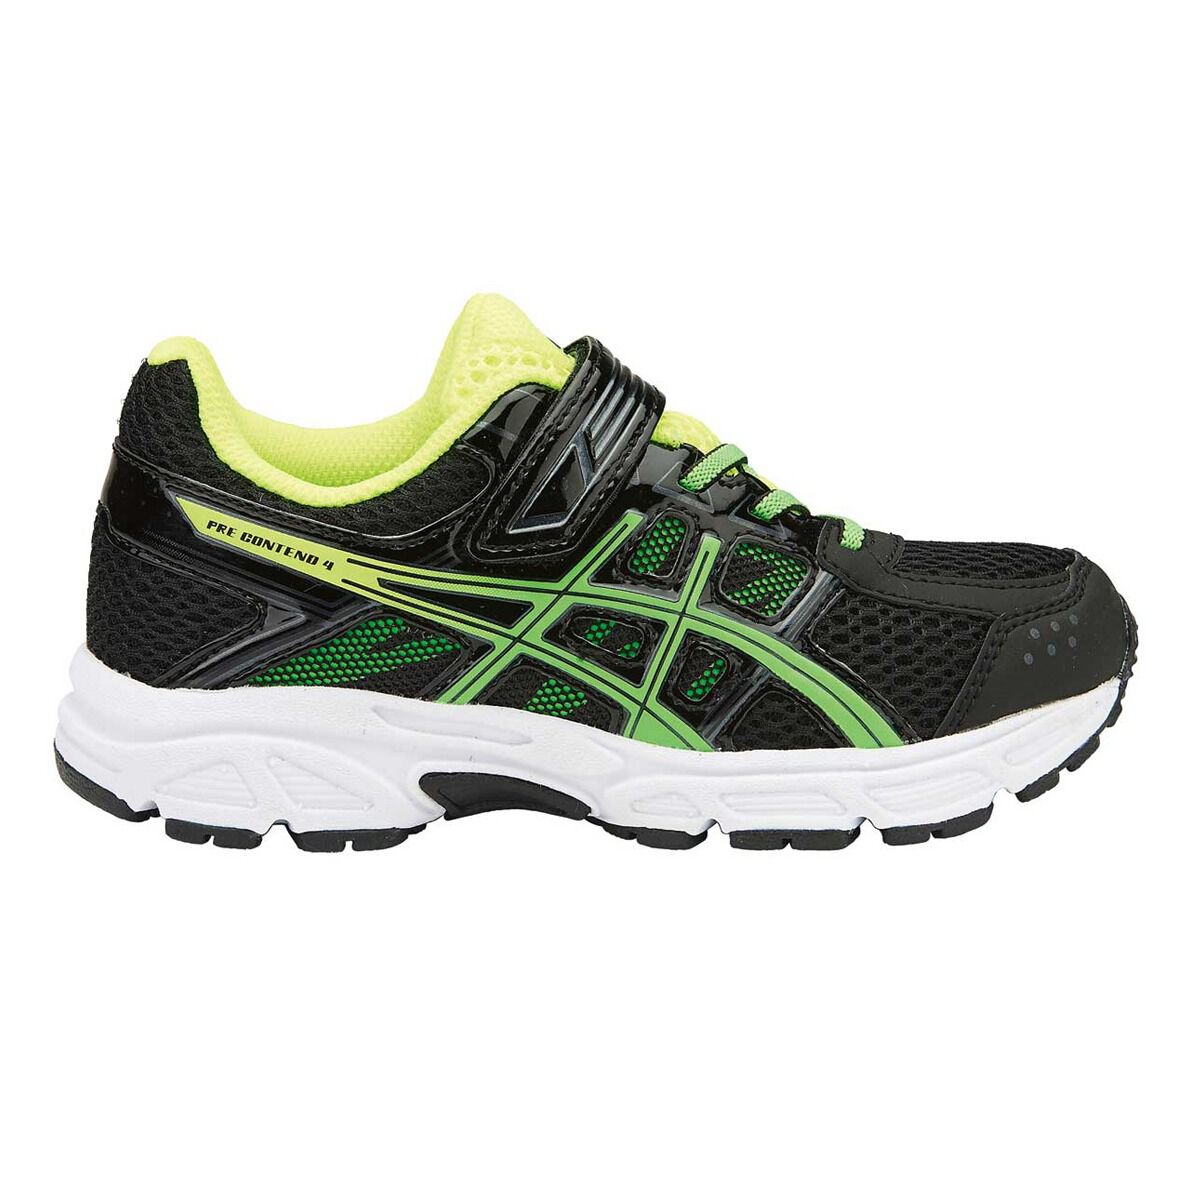 Chaussures de 8644 course Asics de Pre/ Contend 4 pour garçons Noir/ Vert US 11 | 59c7b55 - alleyblooz.info